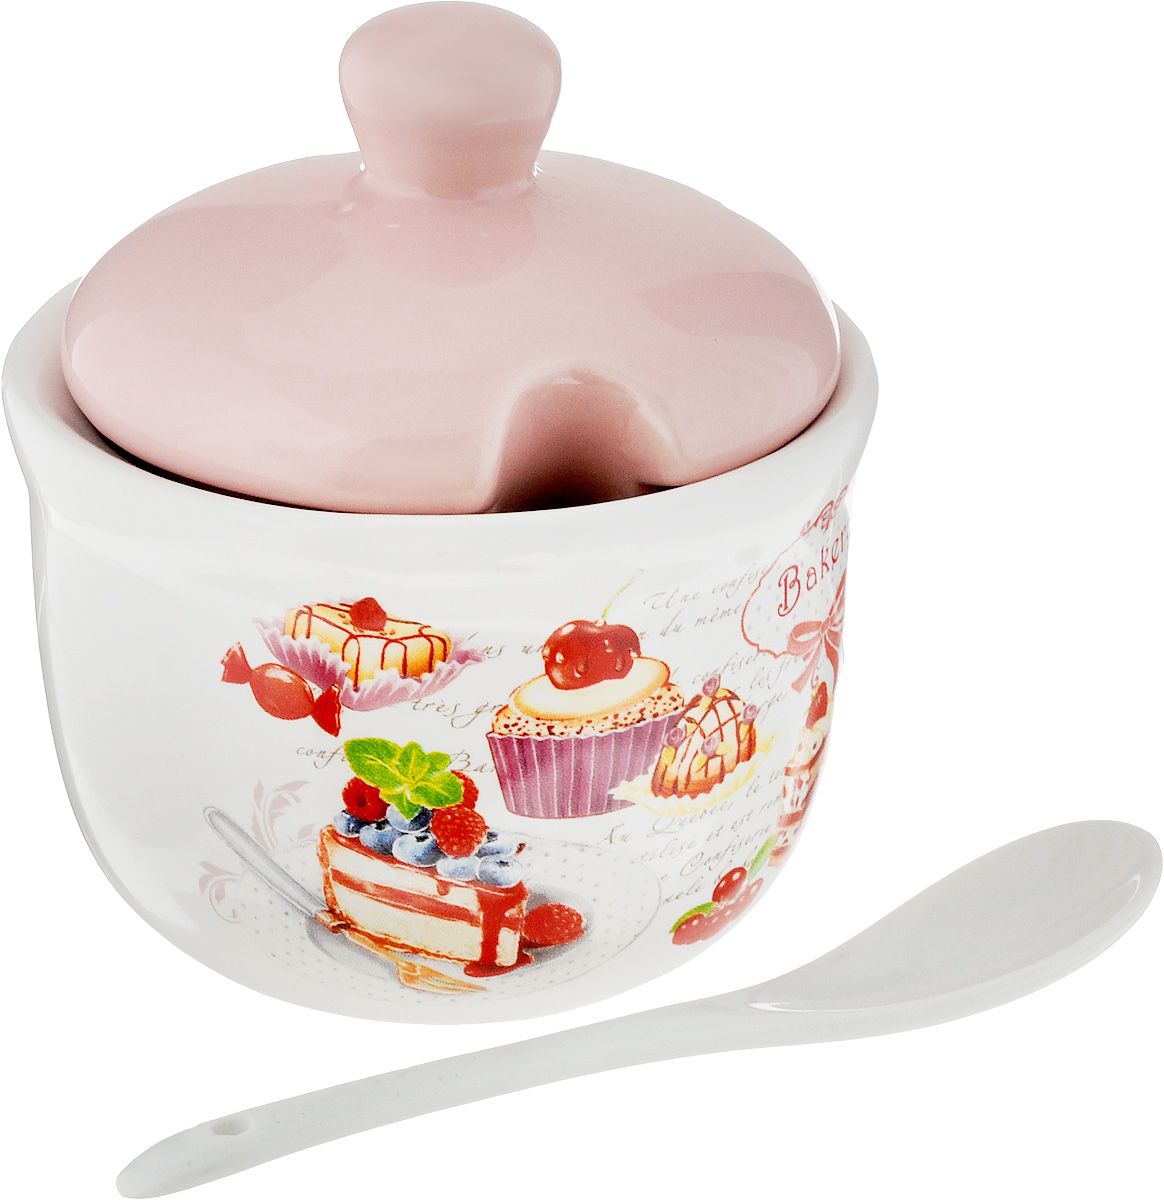 Сахарница ENS Group Бисквит, с ложкой, цвет: розовый, белый, 300 мл, 2 предмета. L3170209 сахарница ens group севилья с ложкой 500 мл